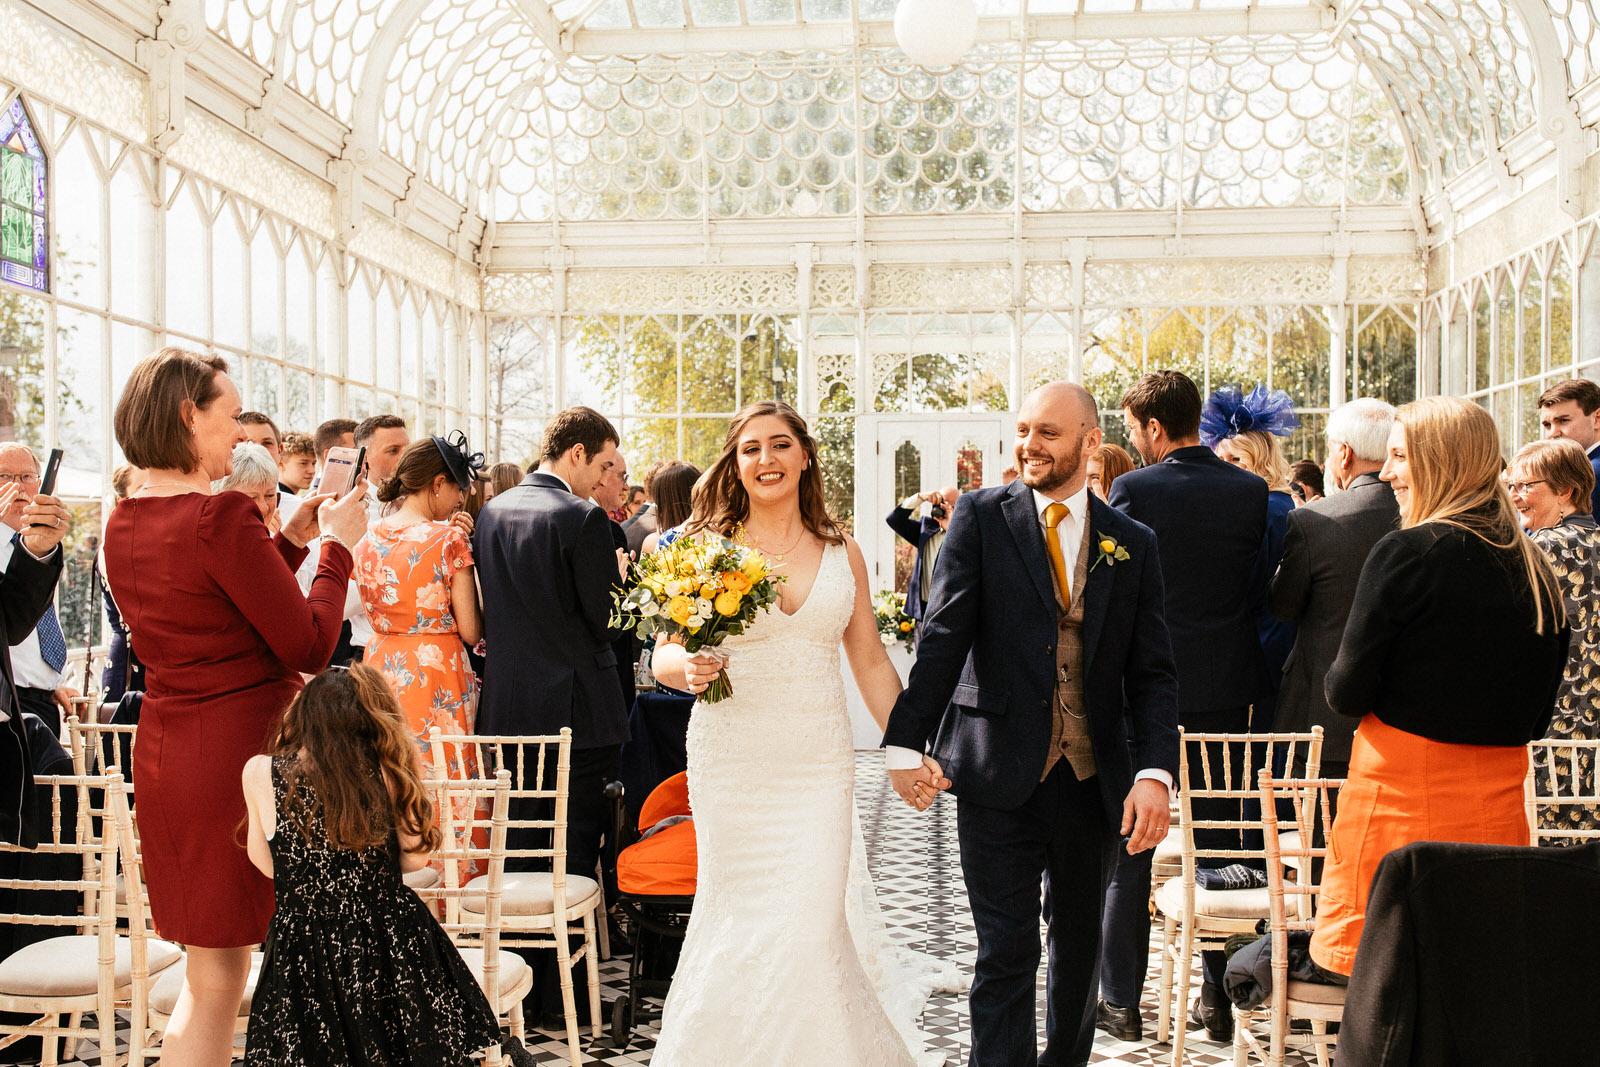 Jenni-and-James-Wedding-Highlights-21.jpg